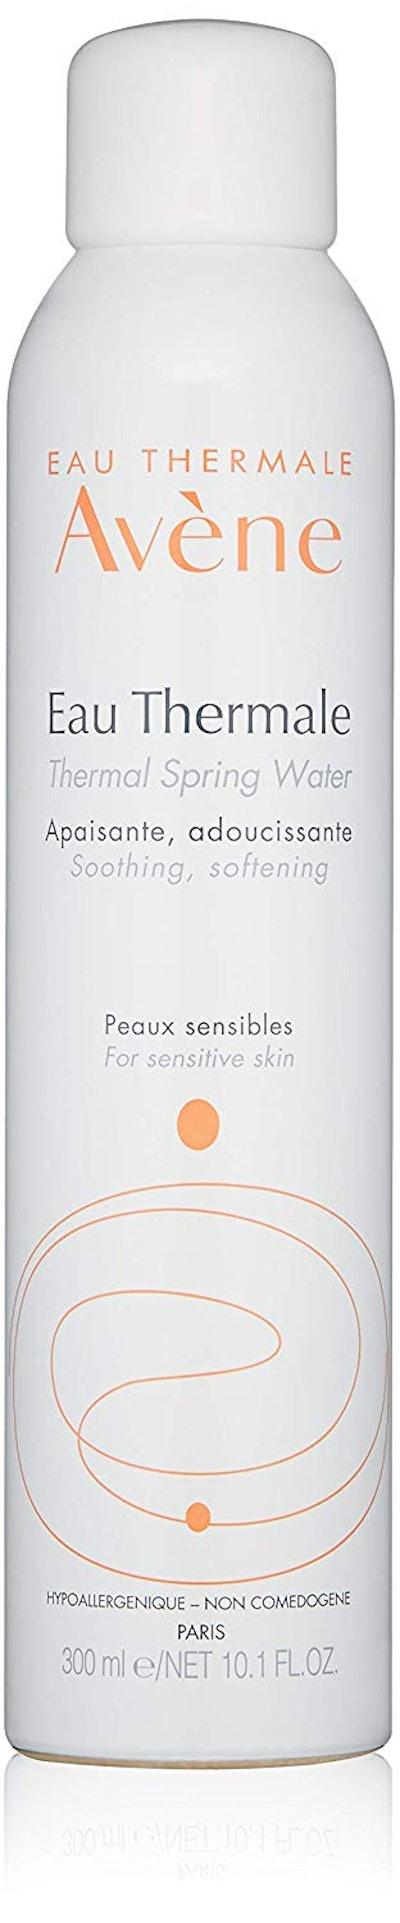 Avene Eau Thermale Thermal Spring Water Facial Mist Spray